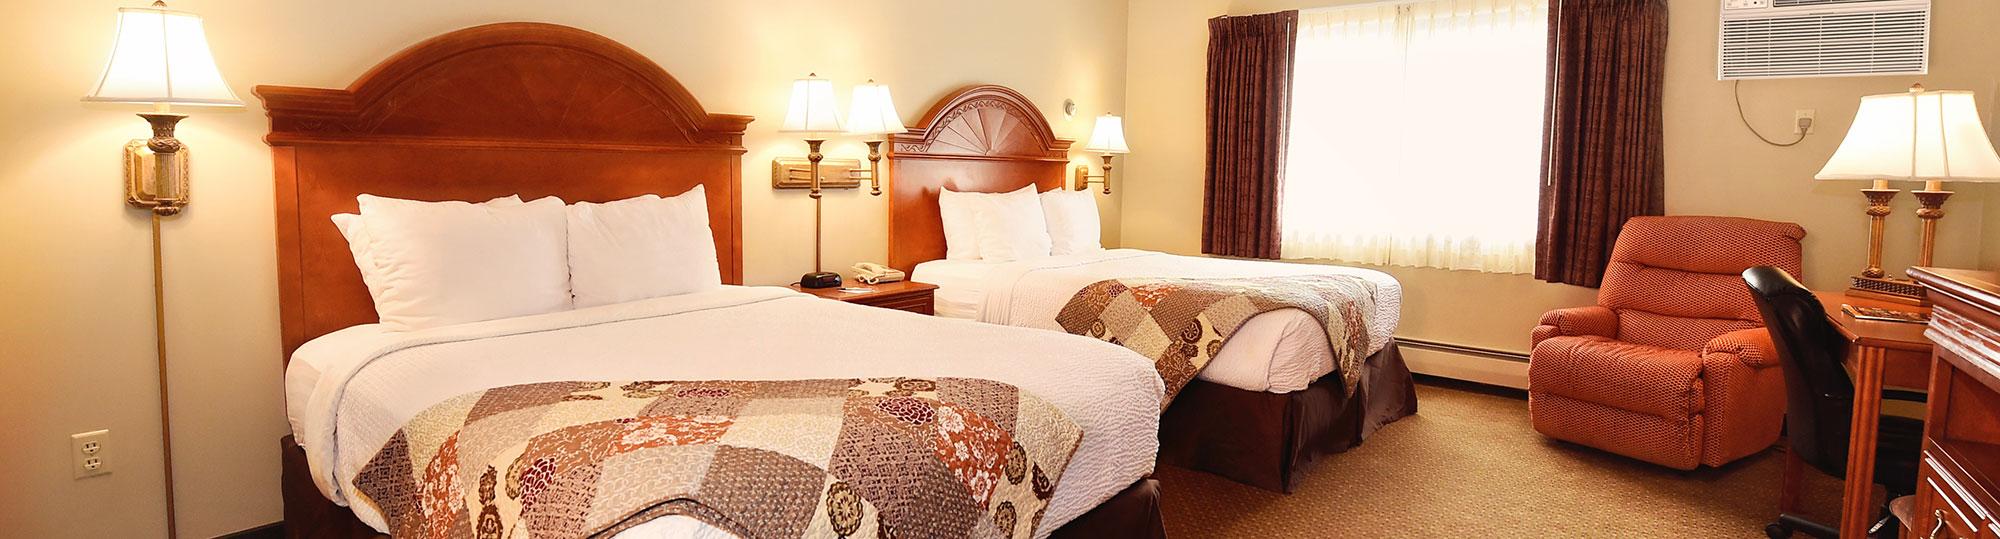 Centerstone Hotel Rochester